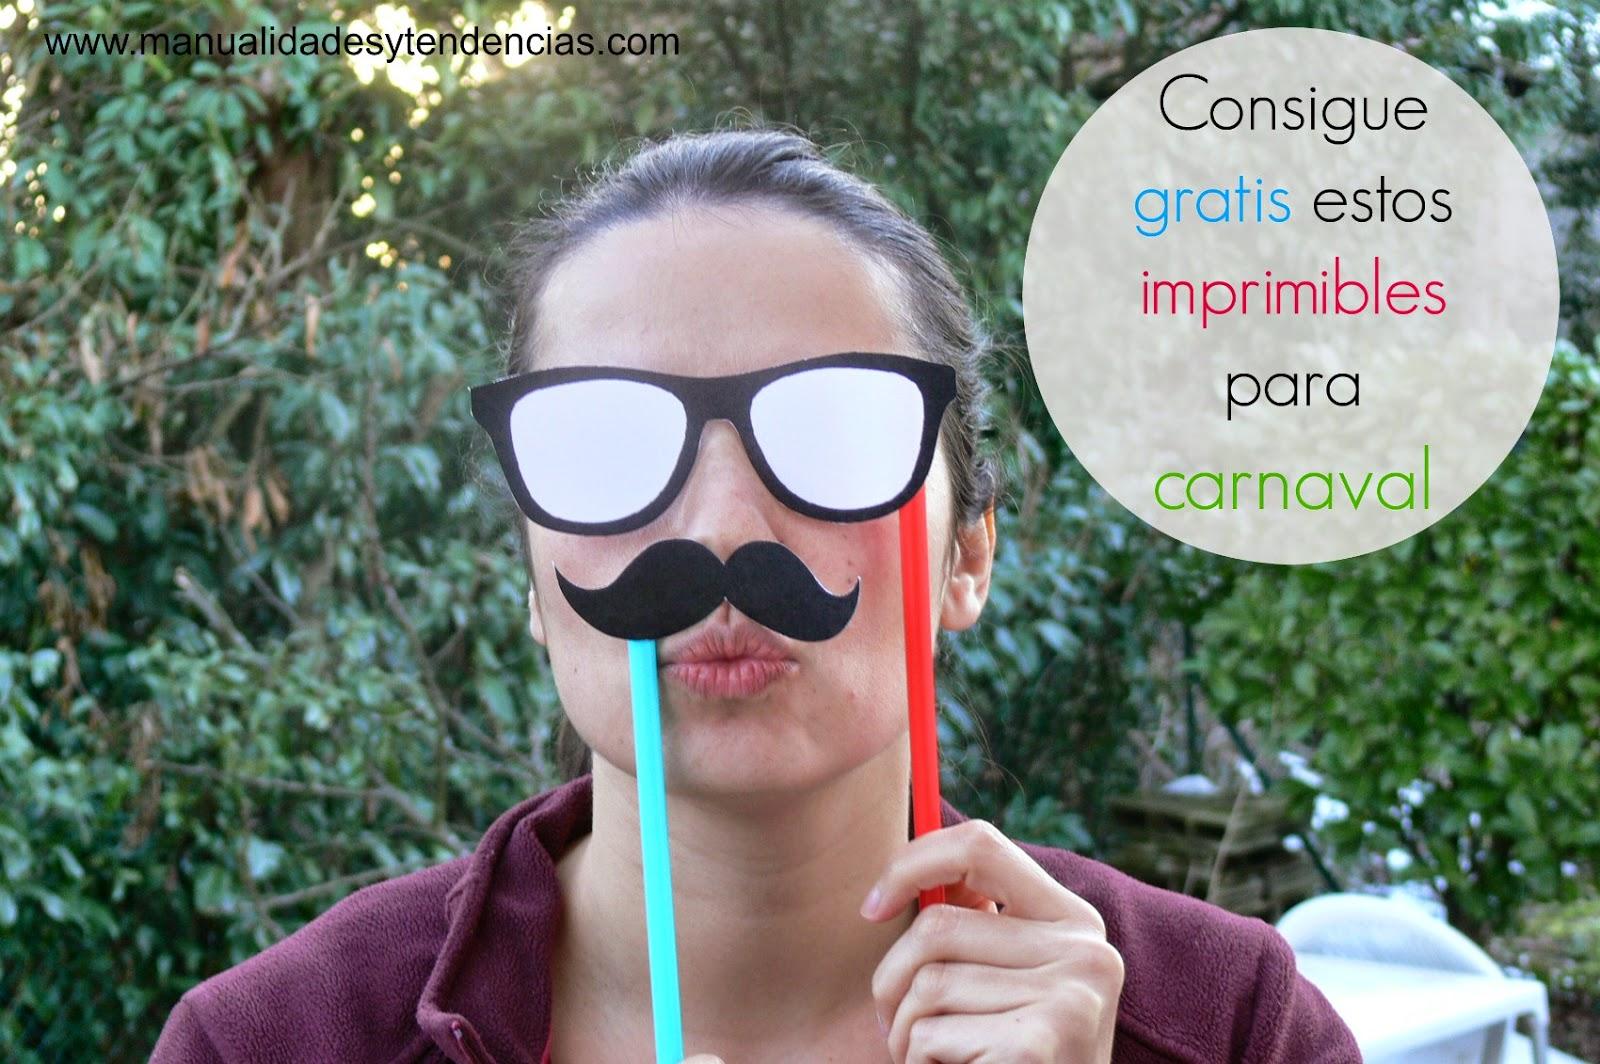 Imprimibles gratis para Carnaval